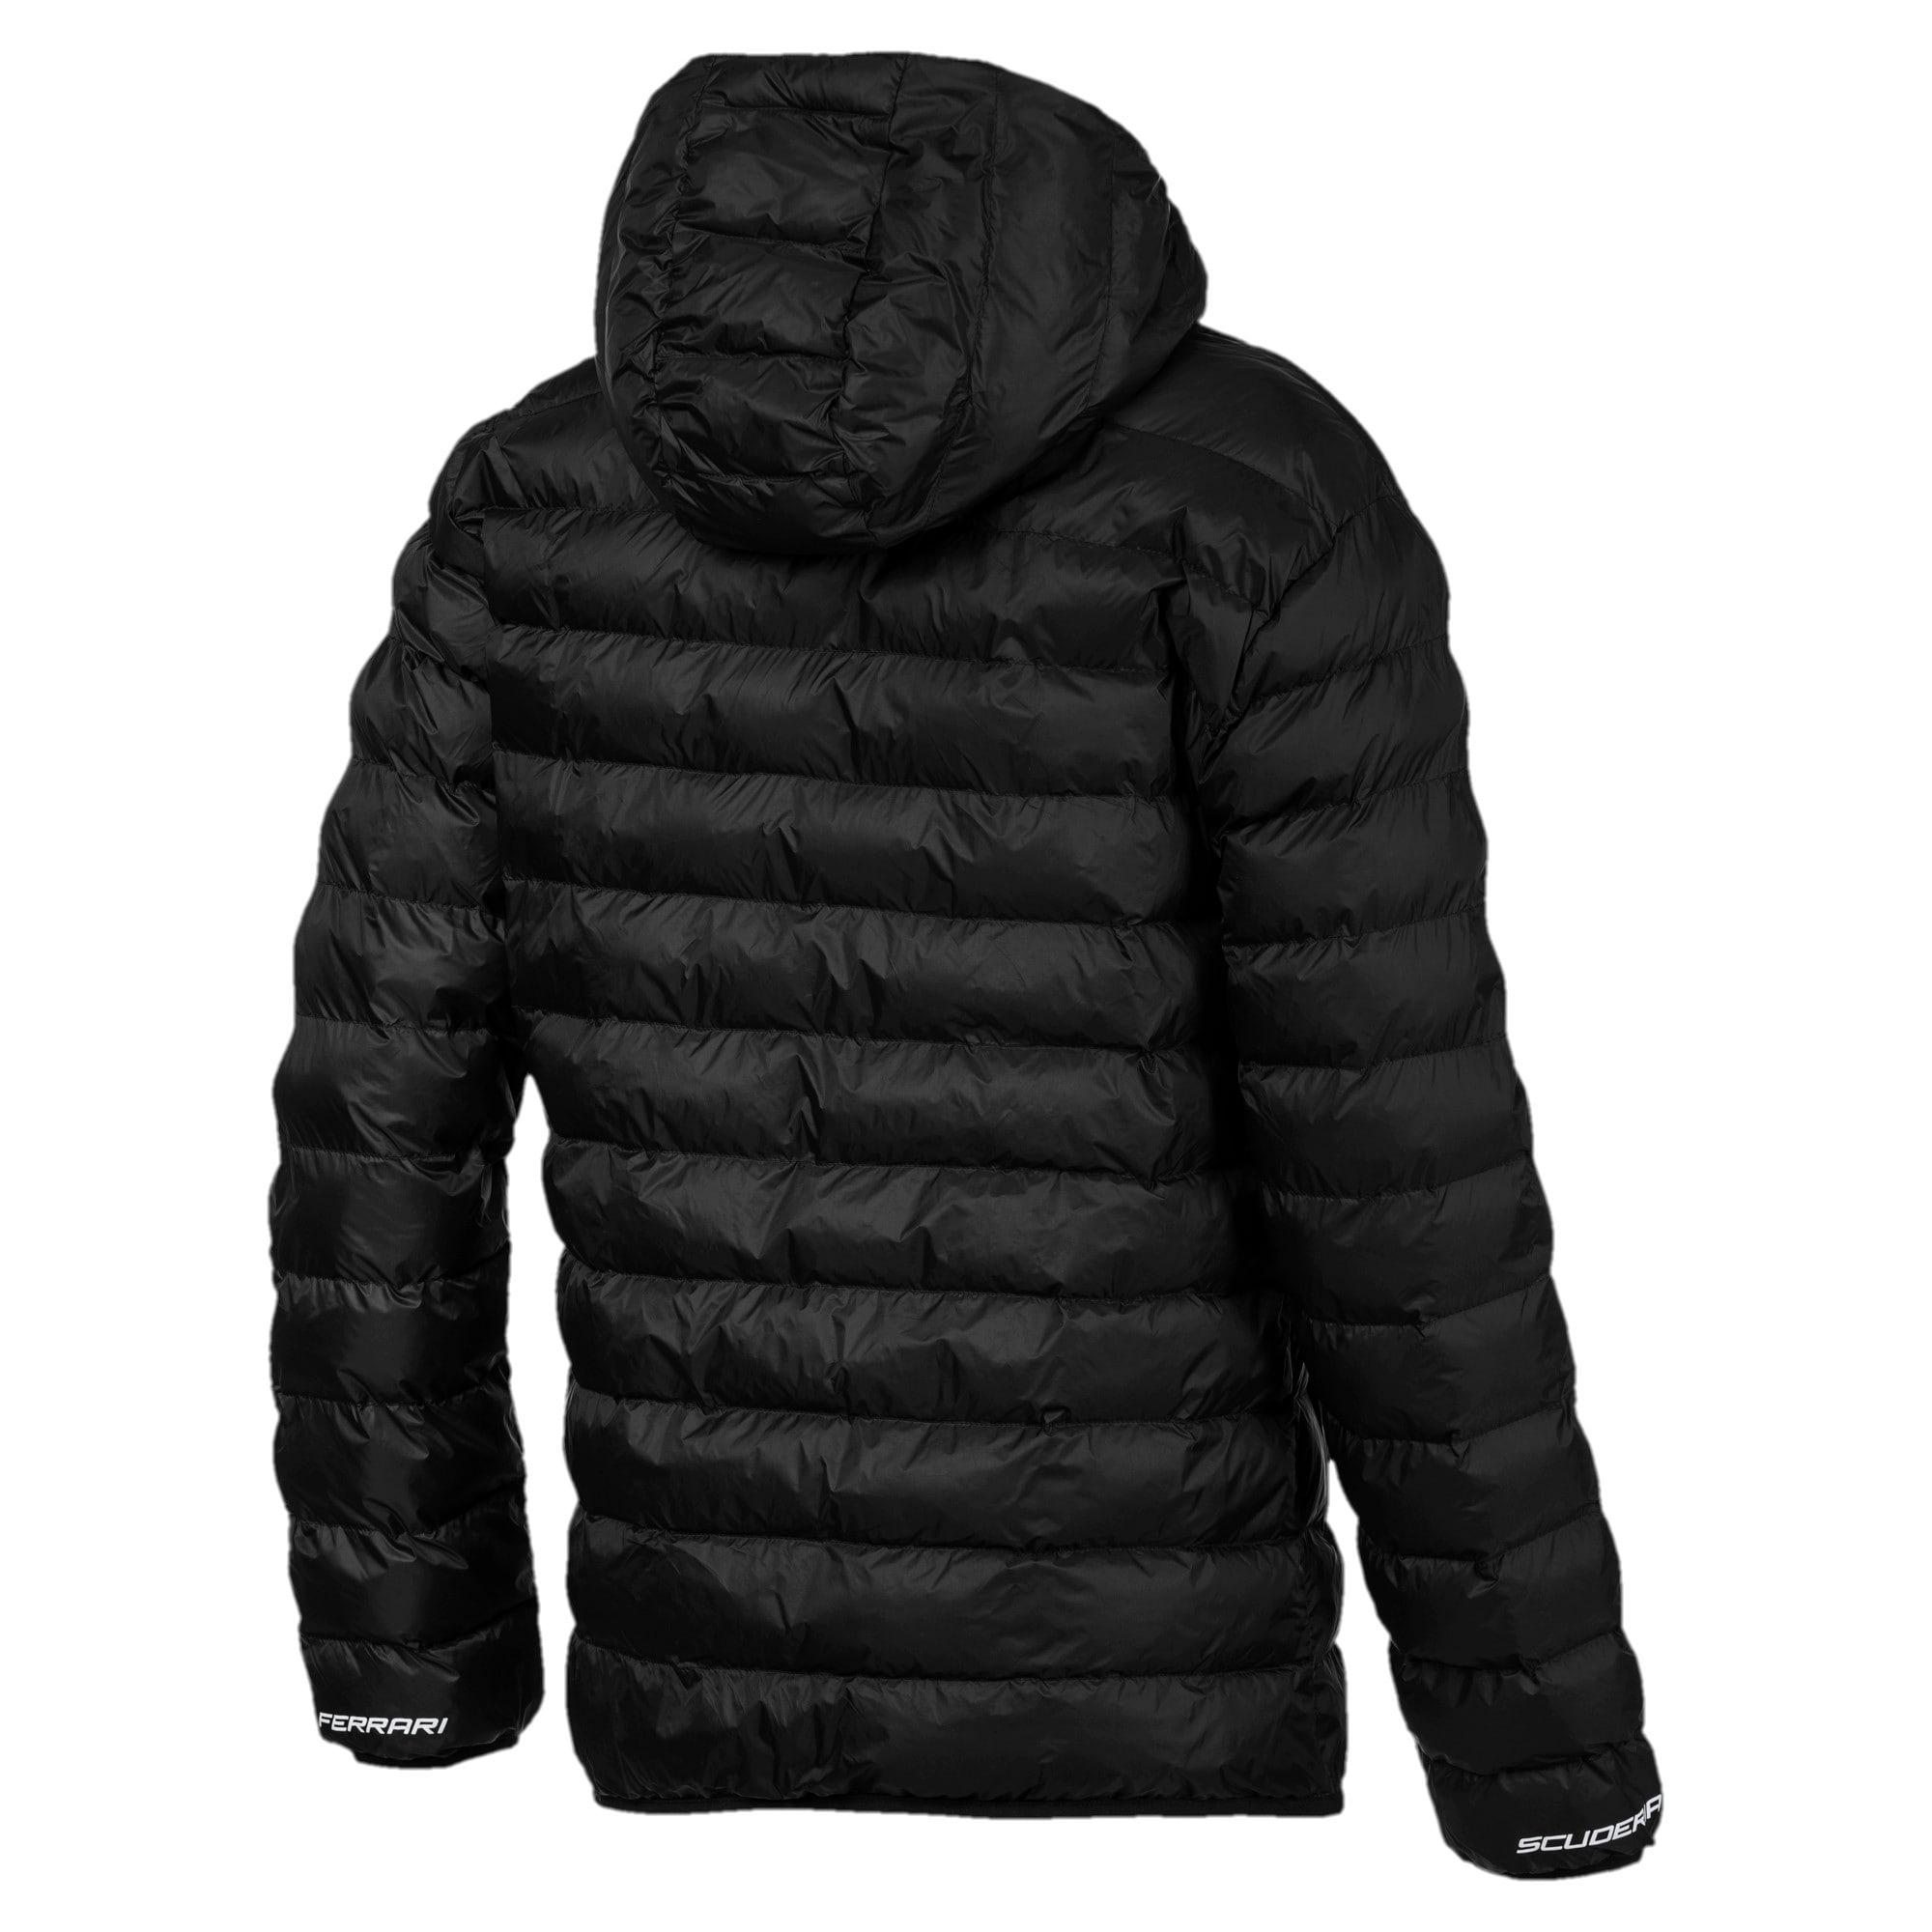 Thumbnail 6 van Ferrari Eco PackLITE jas voor mannen, Puma Black, medium